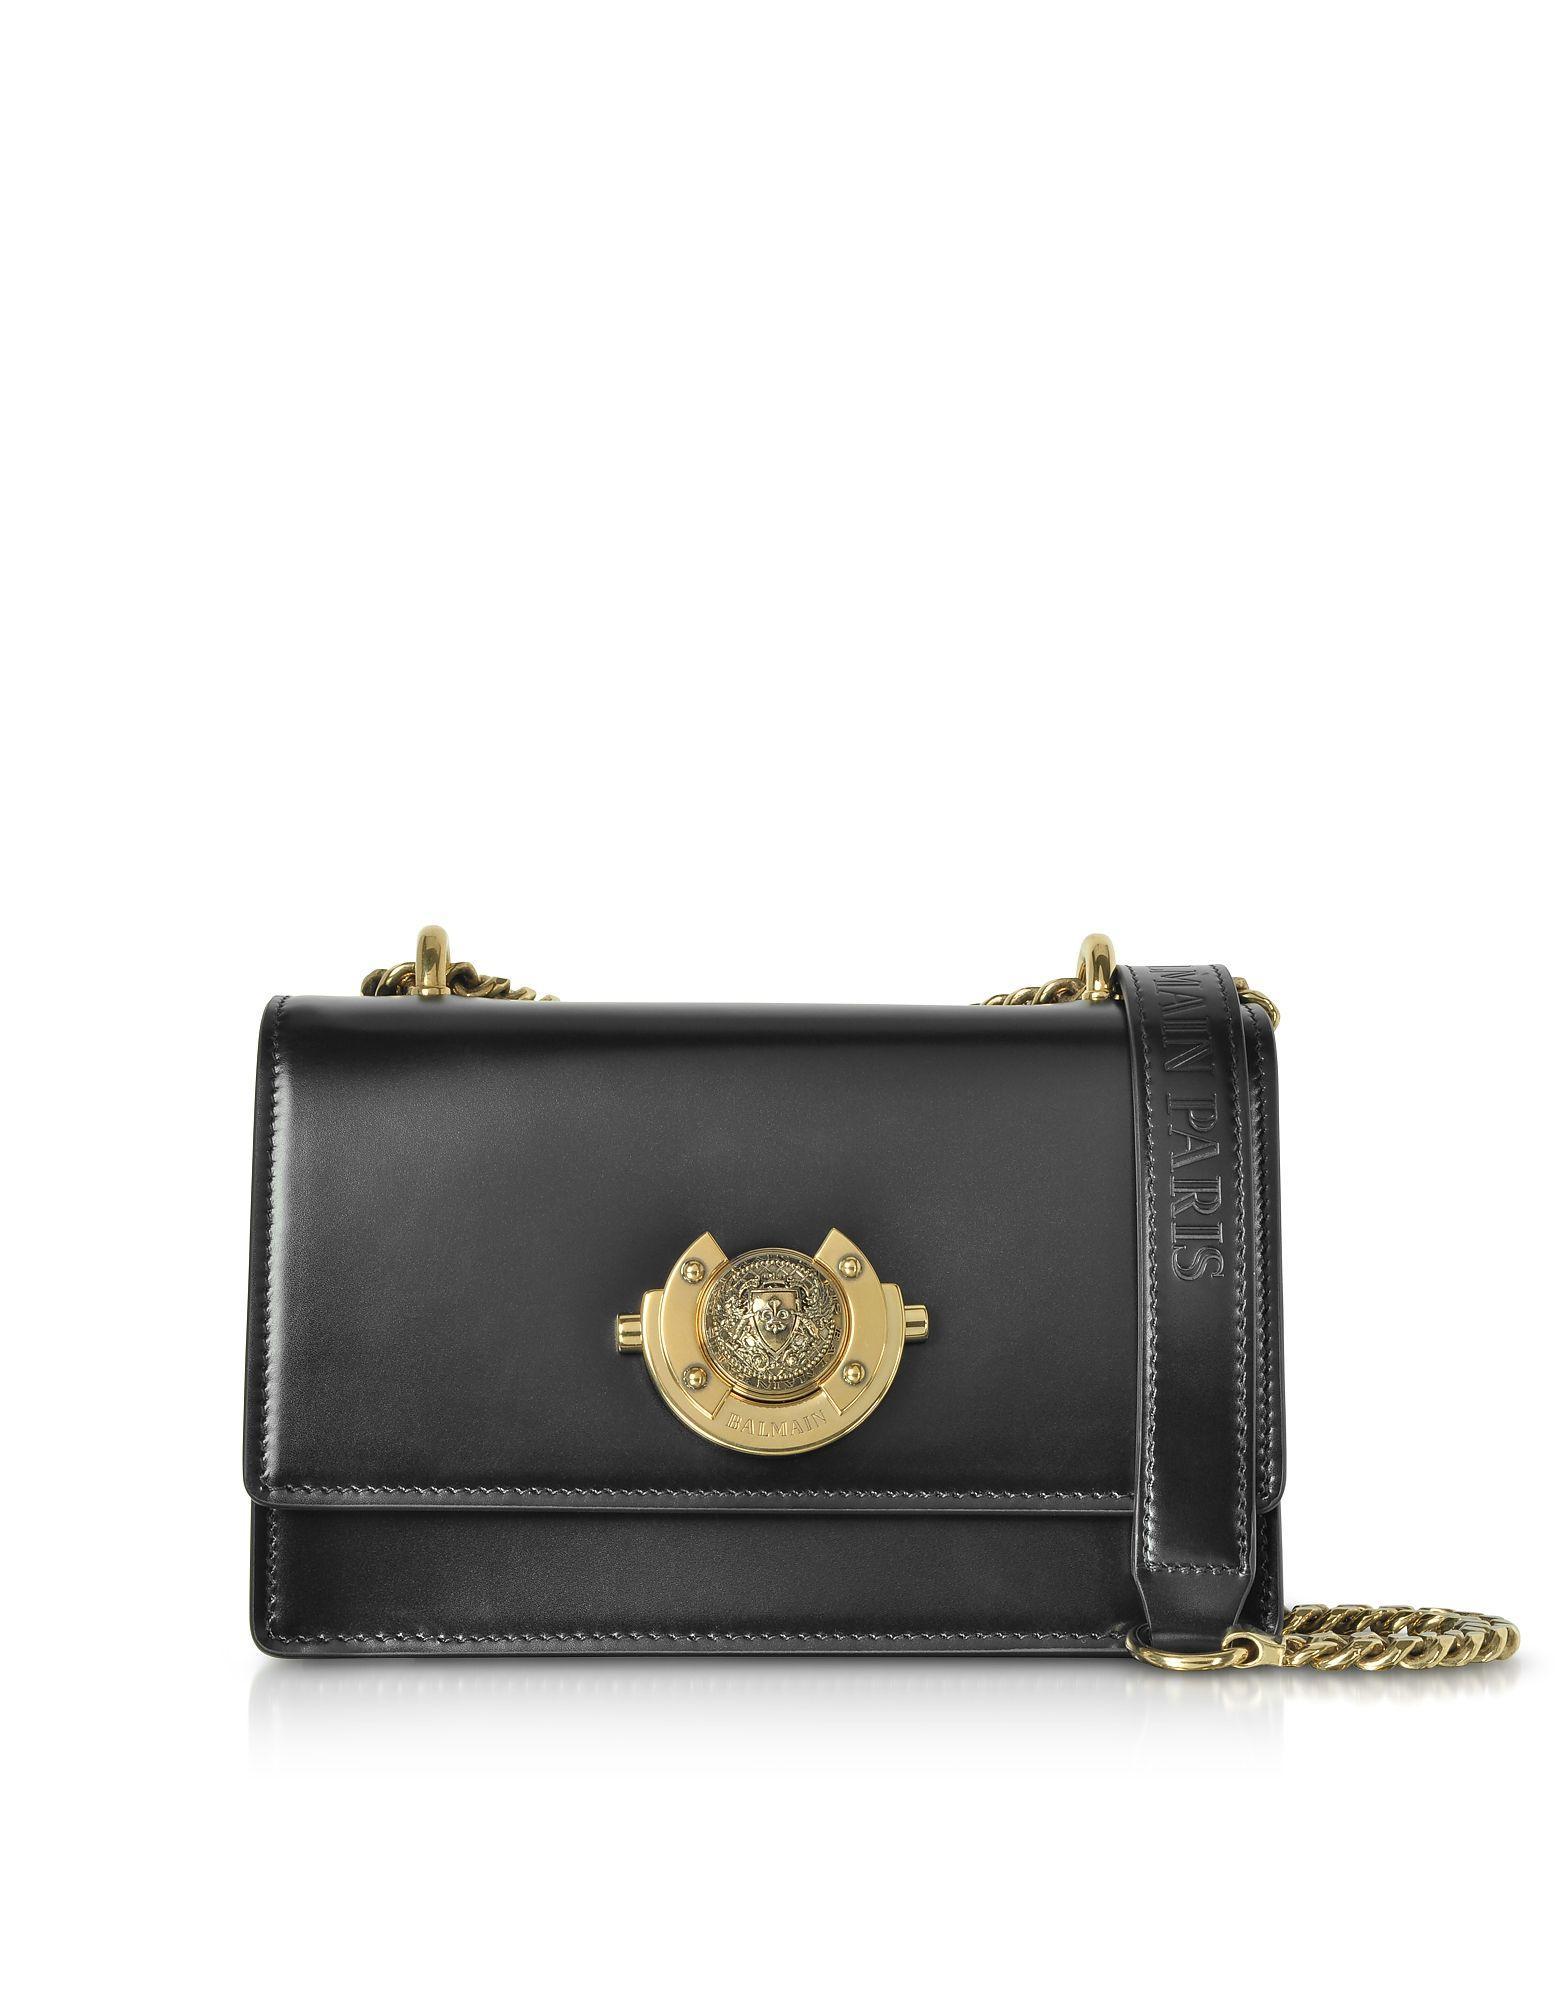 89068b3608e Lyst - Balmain Black Leather Shoulder Bag in Black